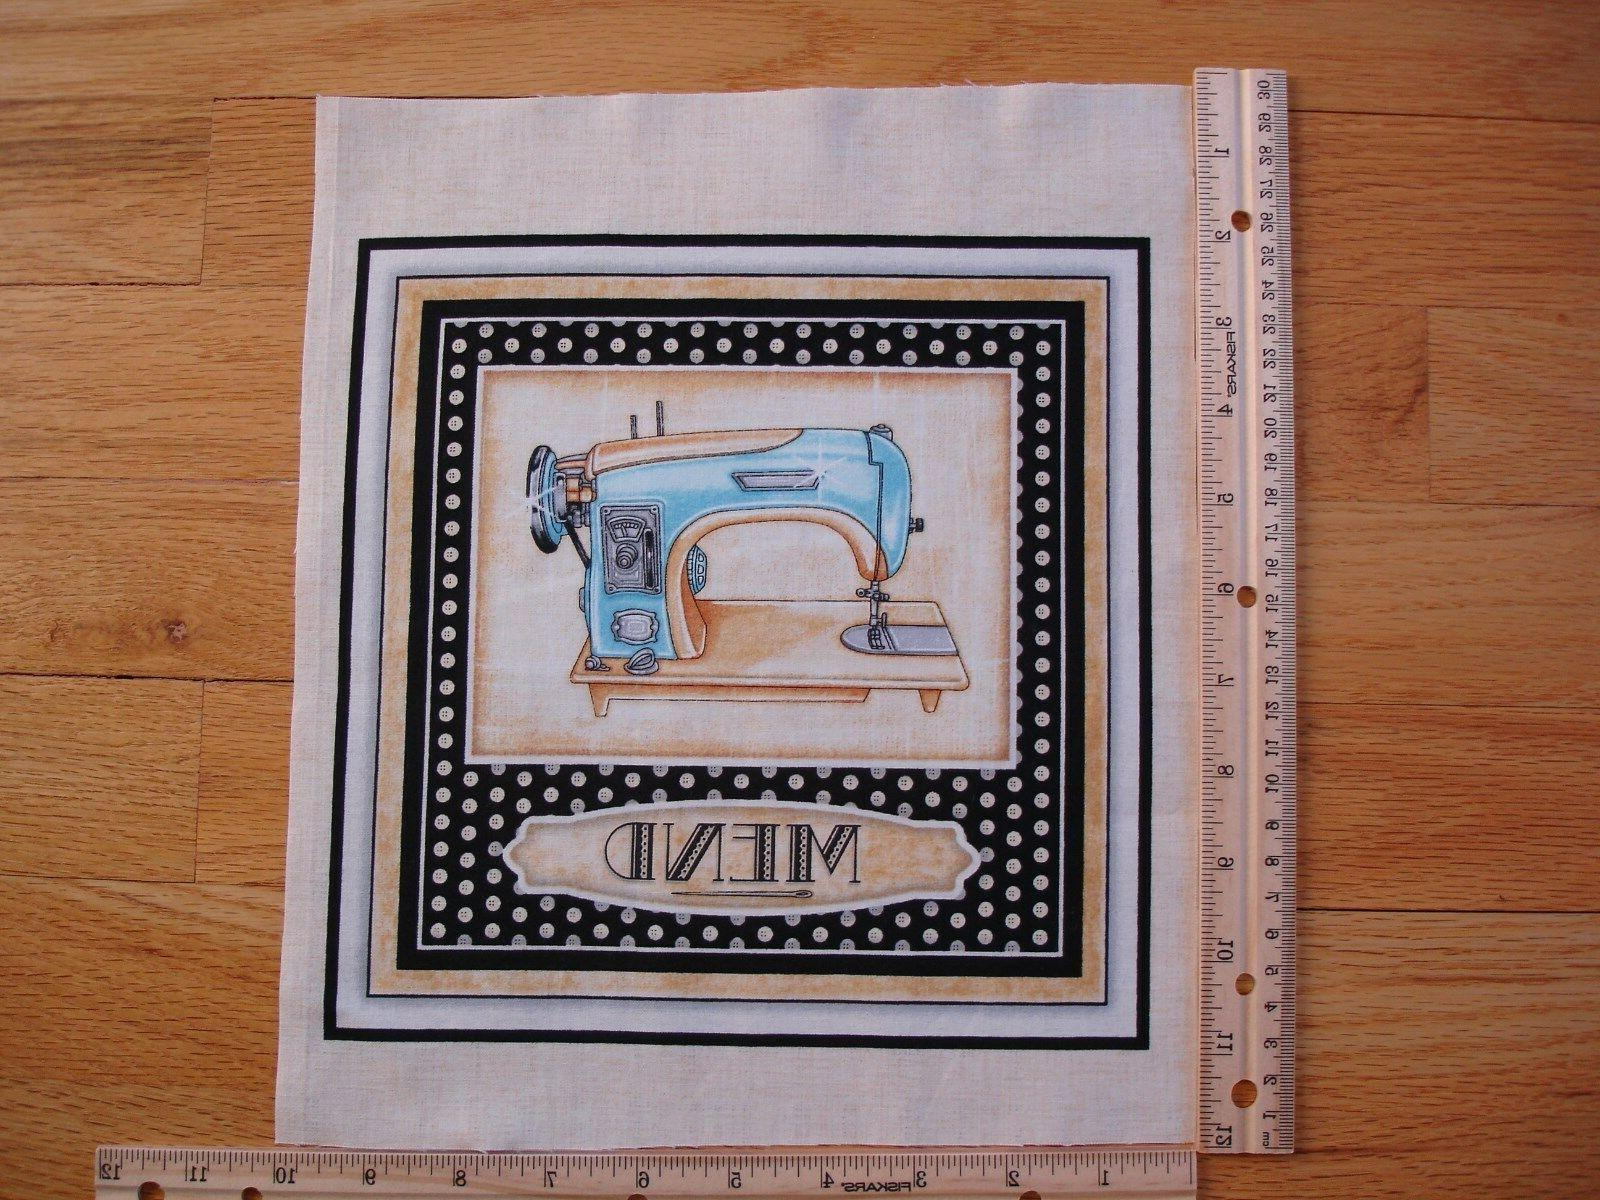 "Retro Blue Sewing Machine "" Mend "" Beige Cotton Quilt Fabric"